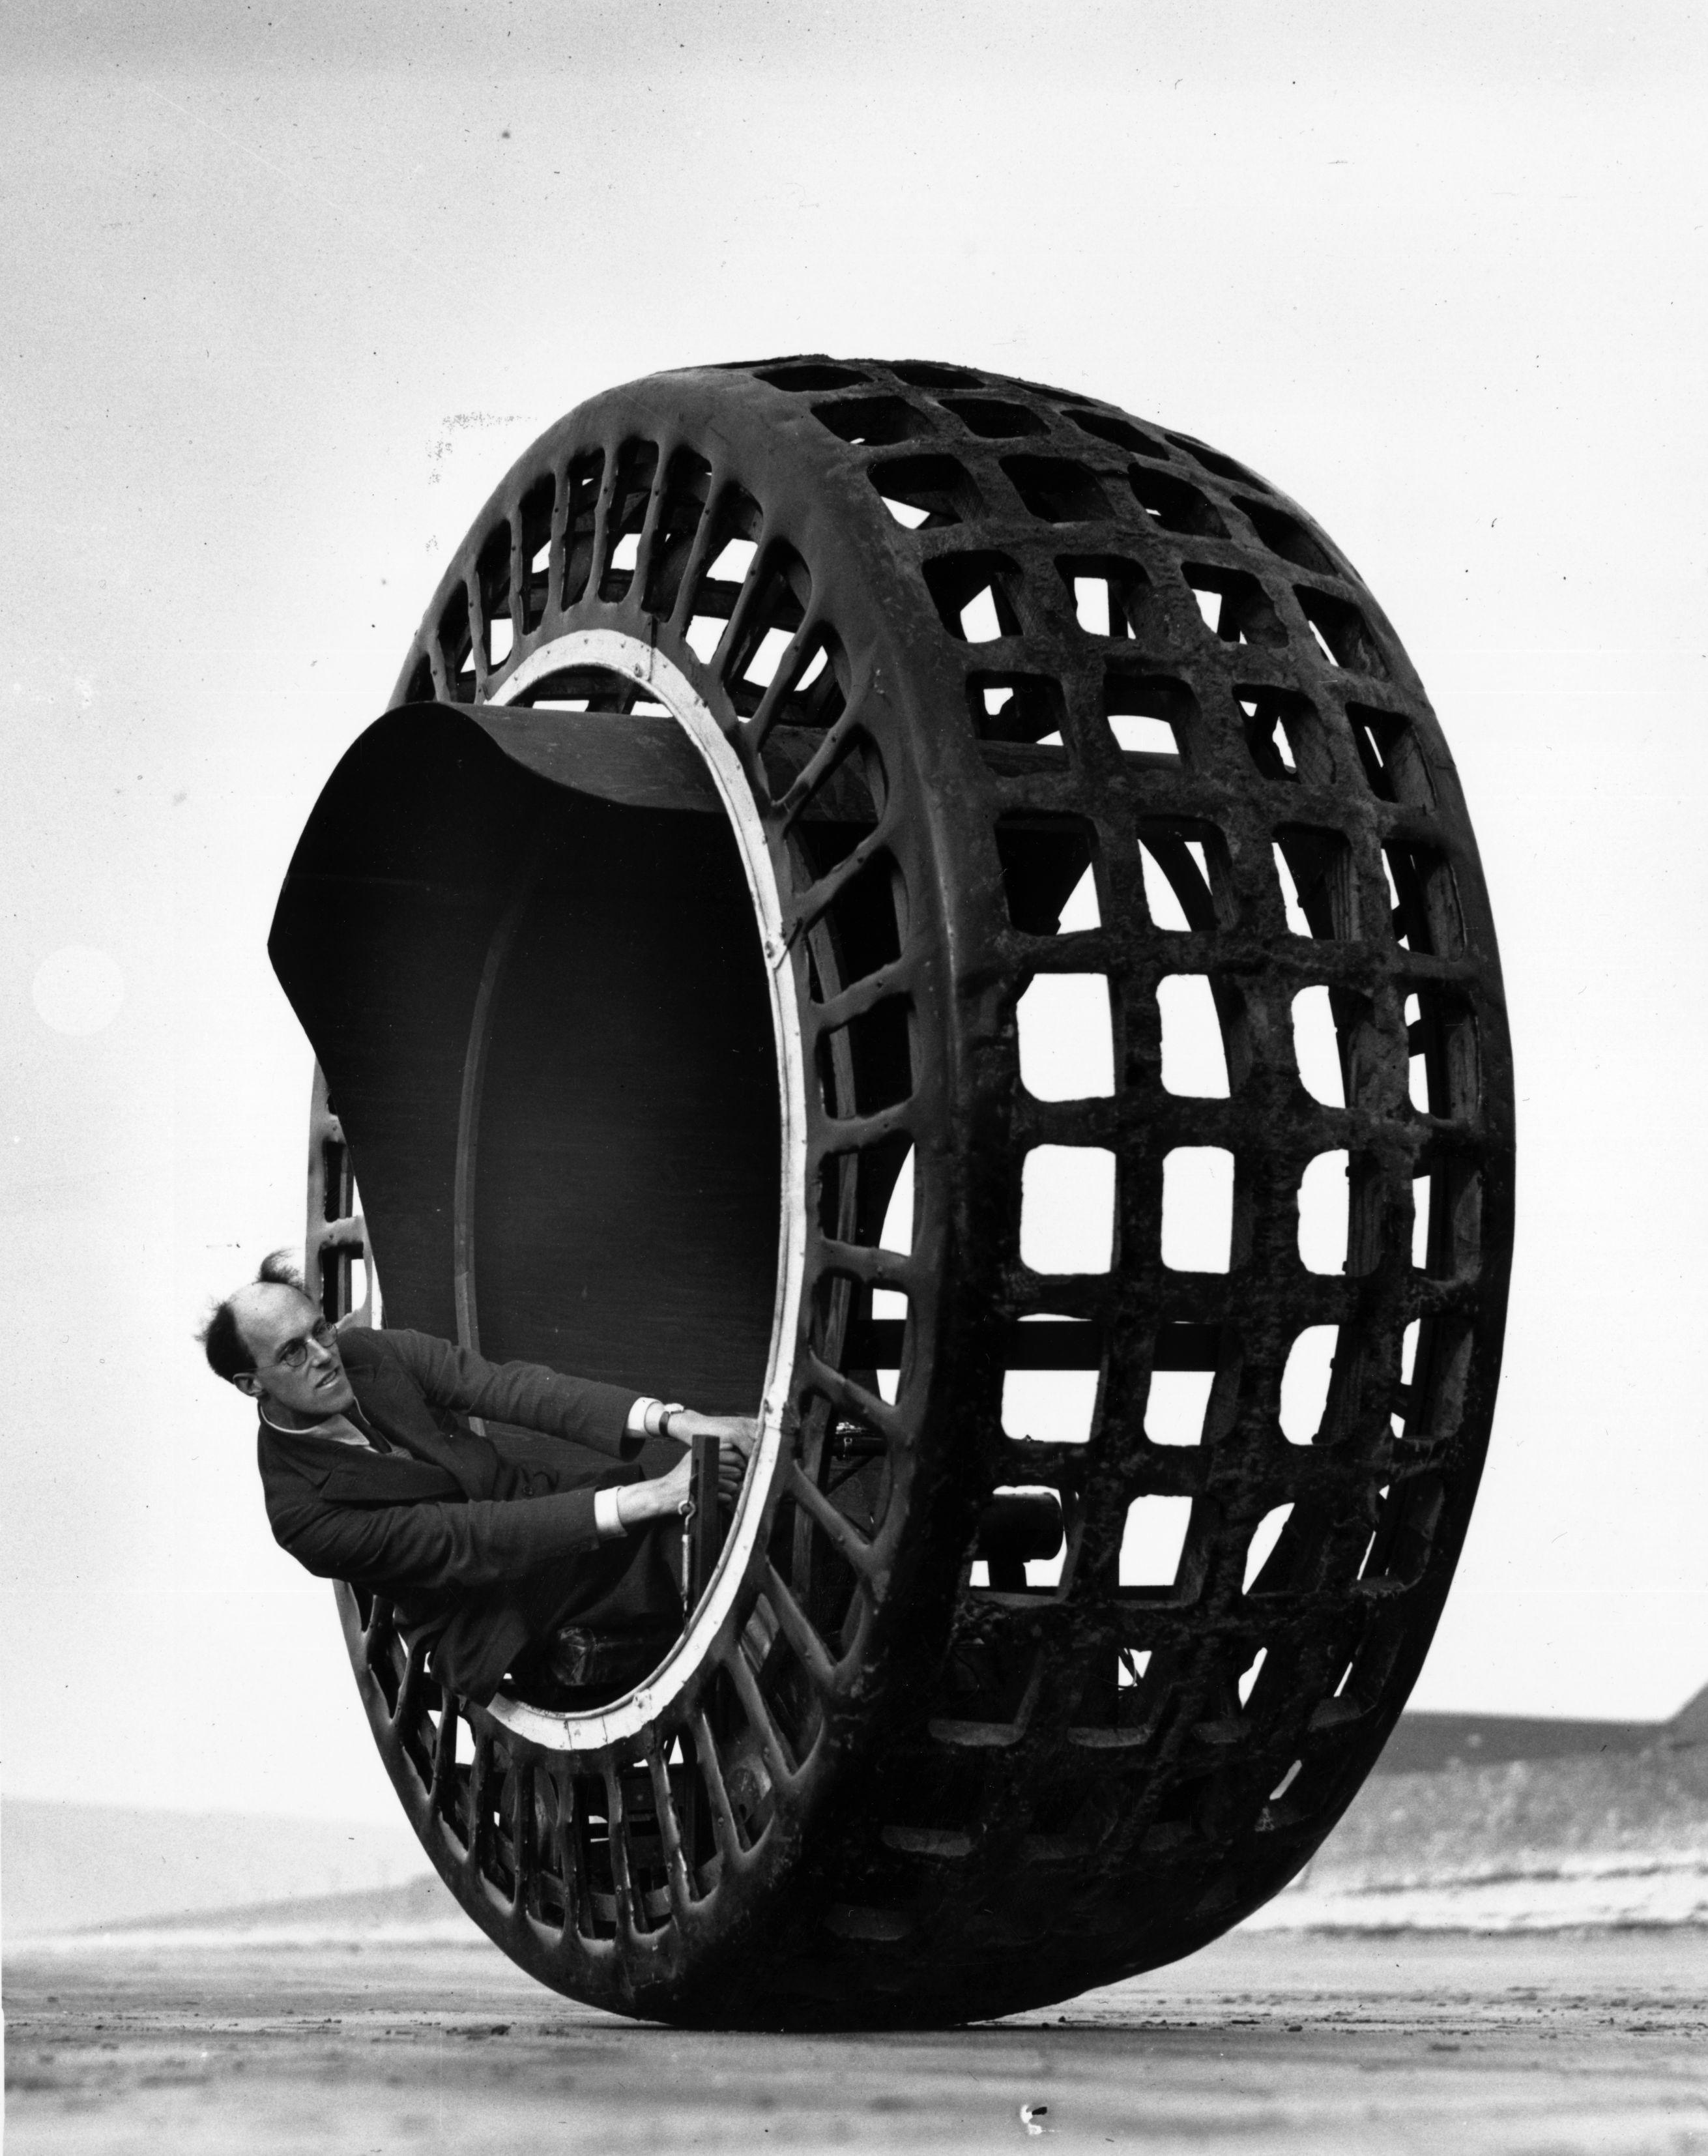 dynasphere monowheel 01 Roulez en Dynasphère